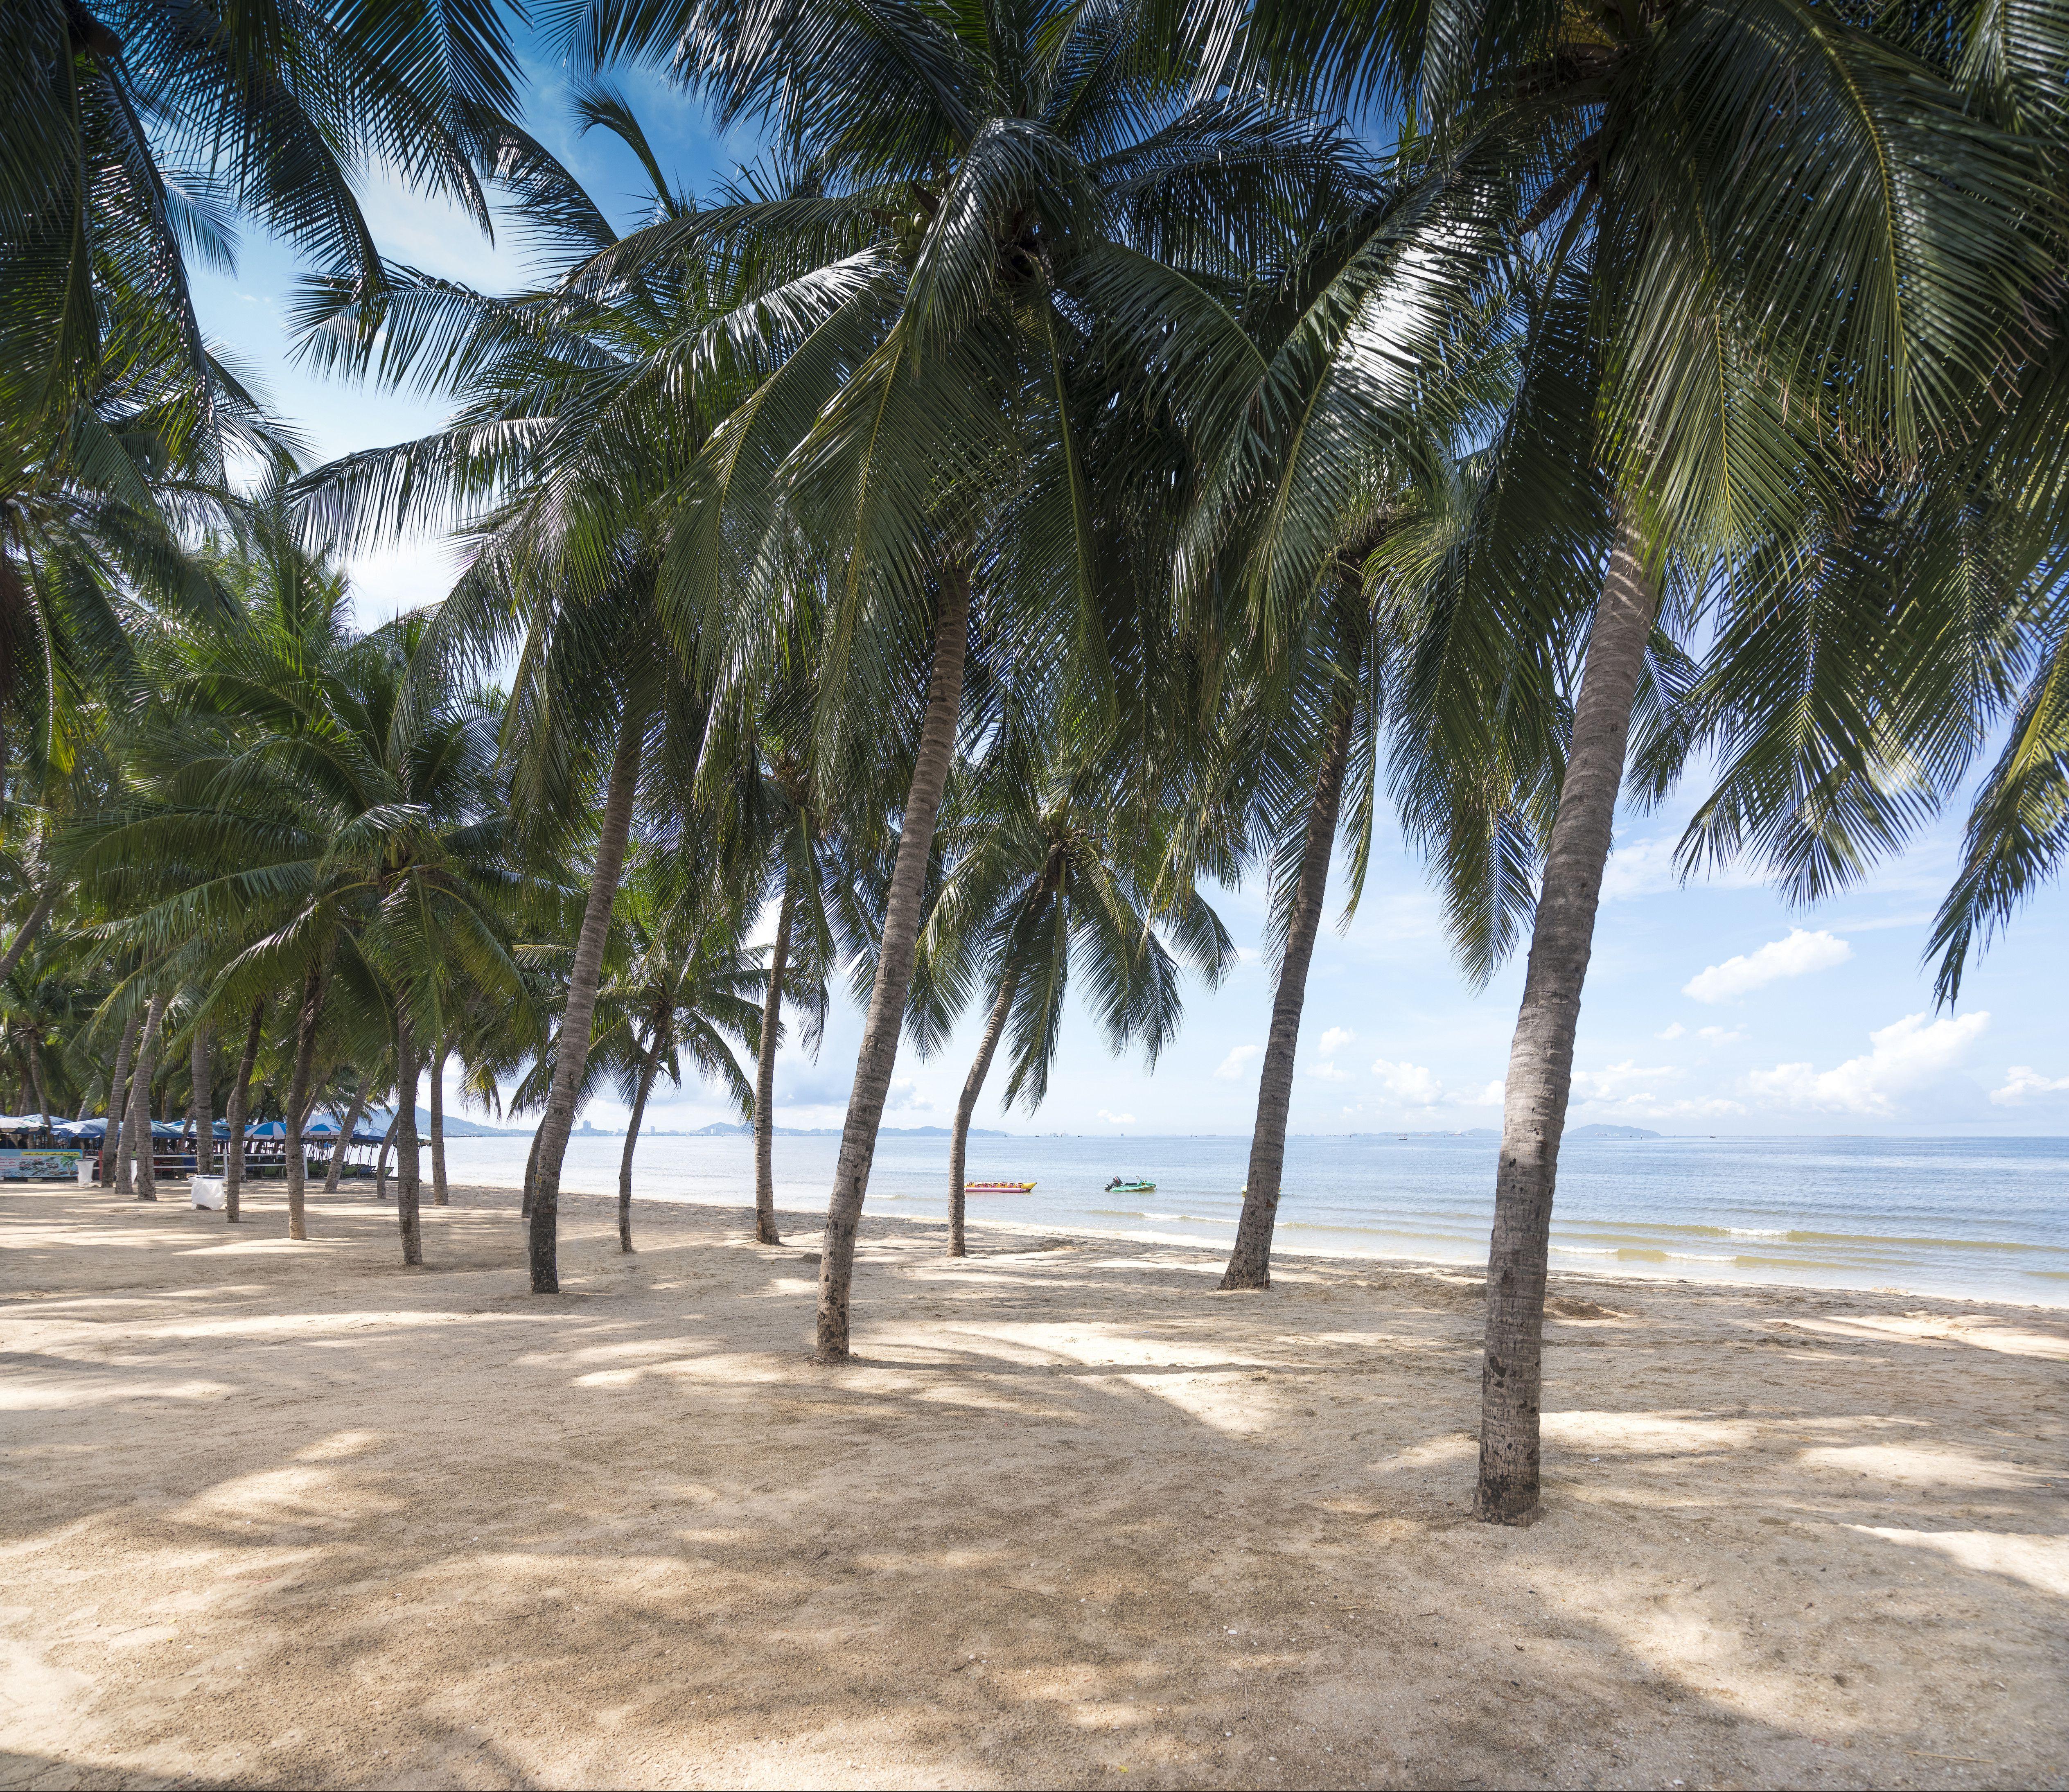 palm trees on Bang Saen Beach near Bangkok